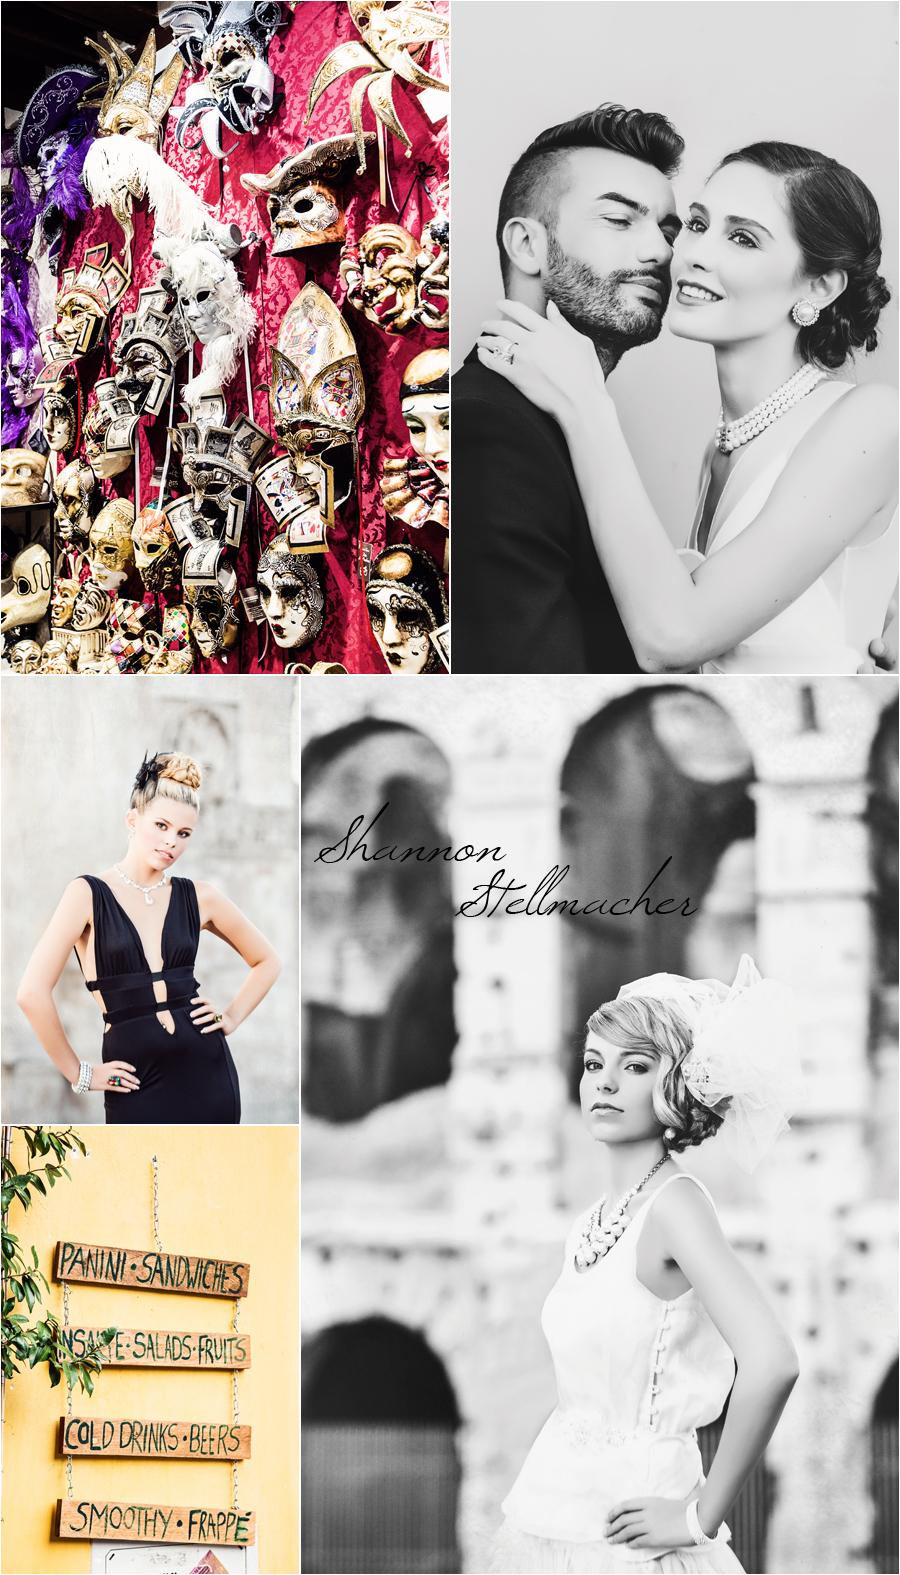 Venice and Rome Bridal Fashion2